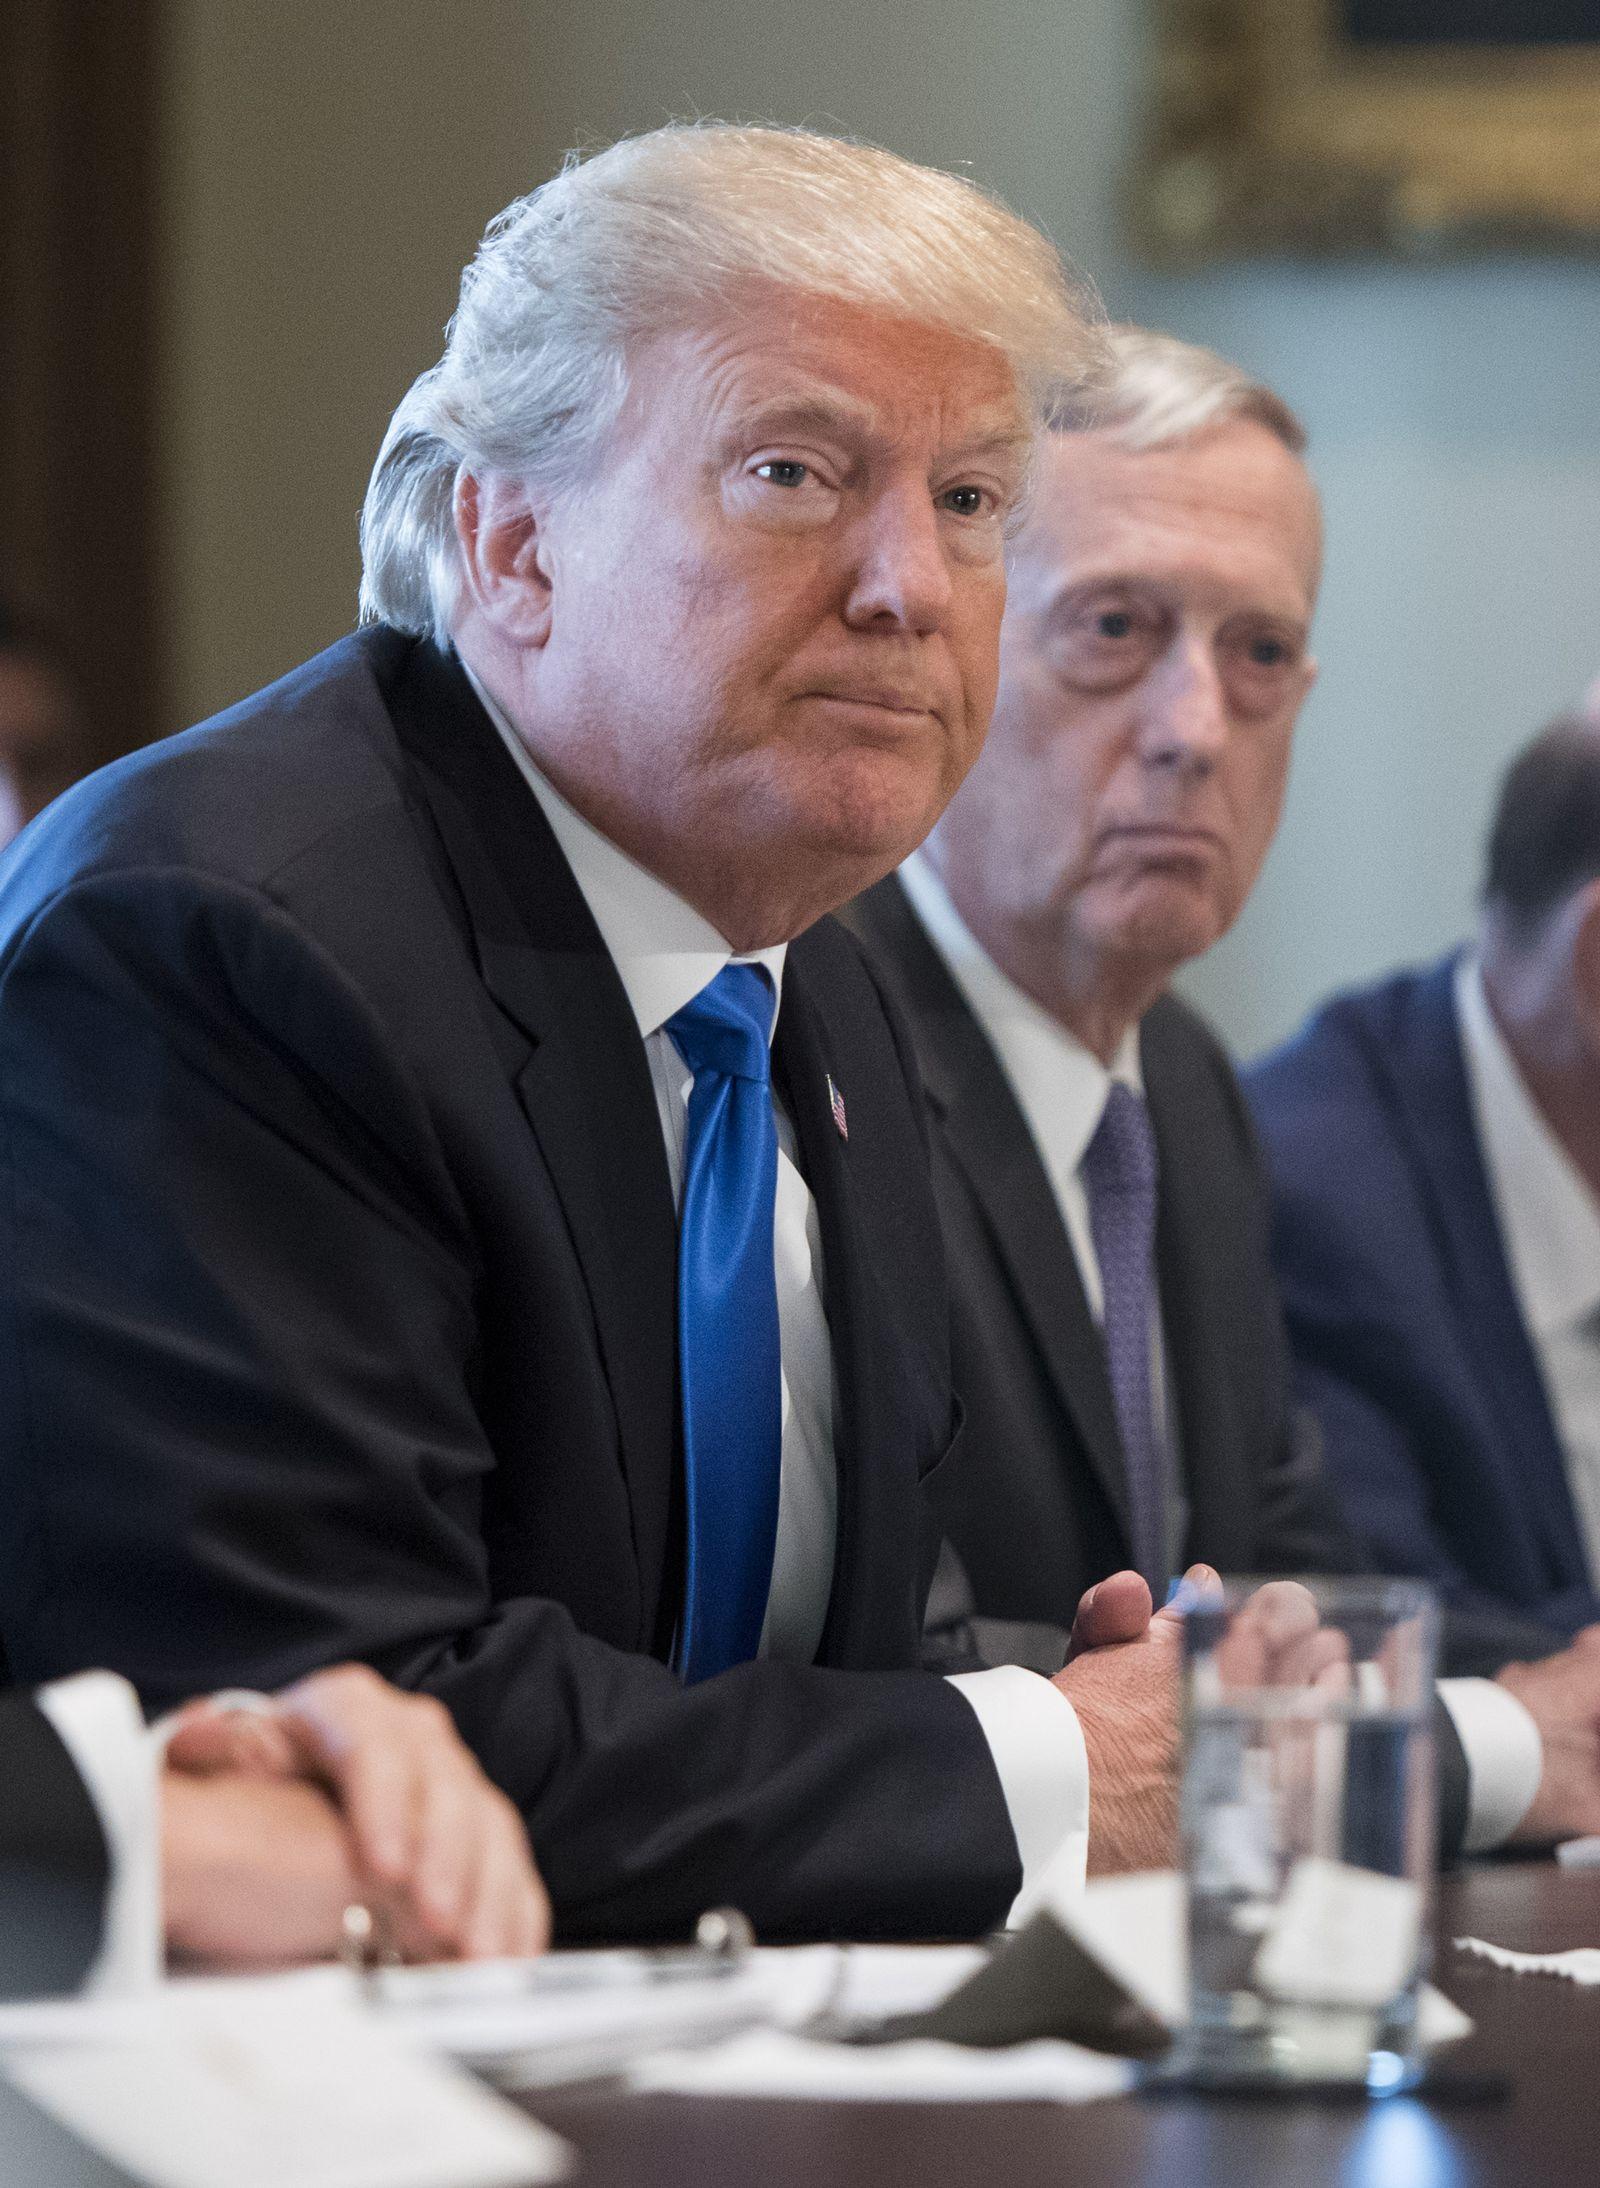 Donald Trump / Jim Mattis